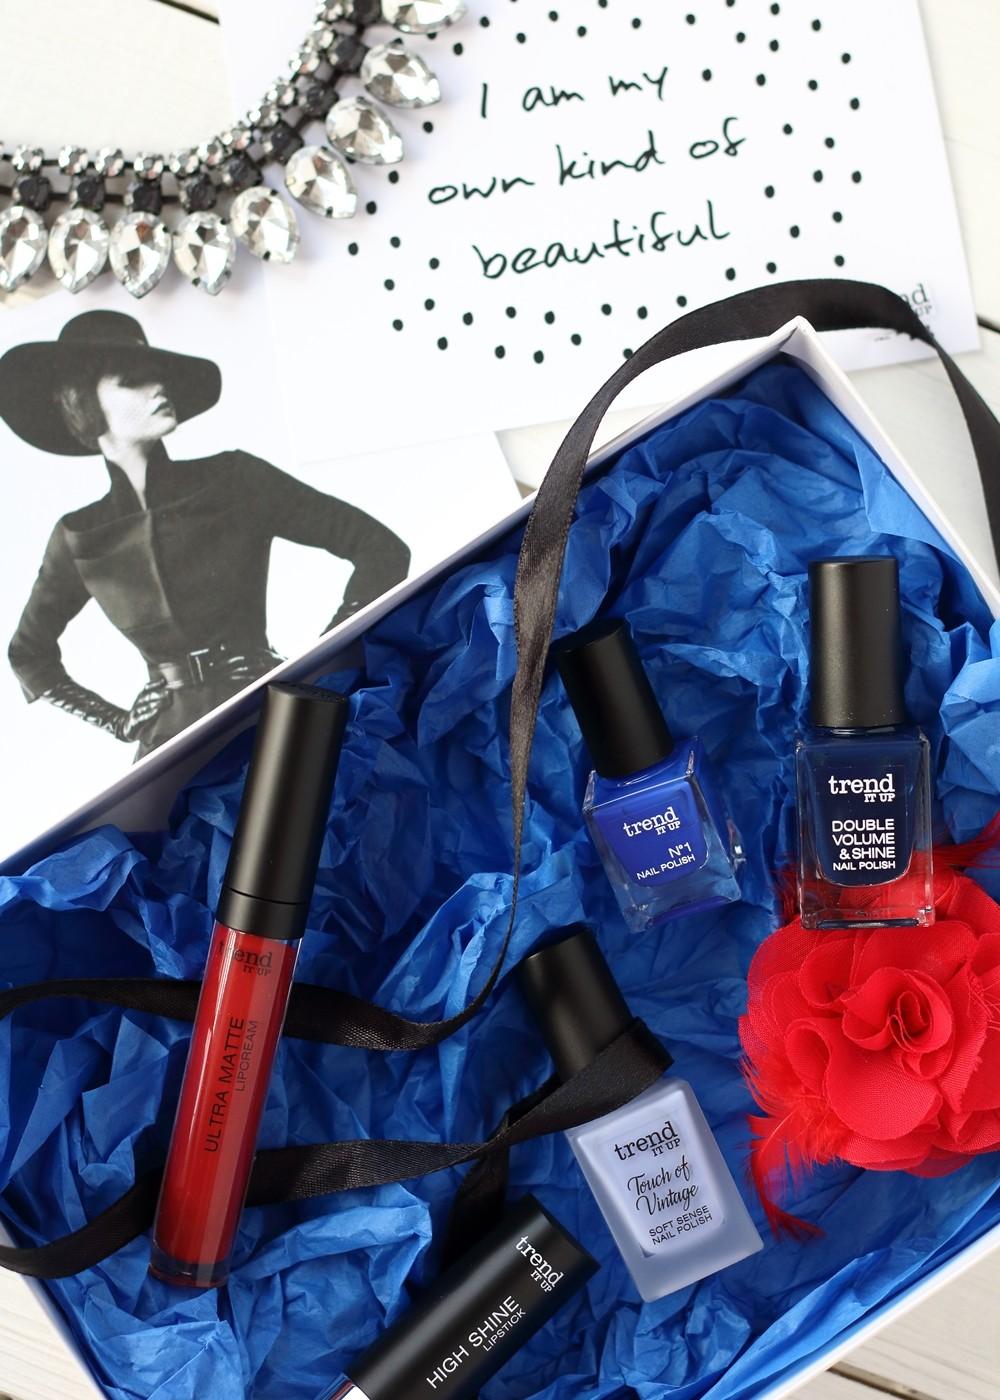 Trend it Up Box Bloggerevent rot blau Nagellack Lippenstift 3